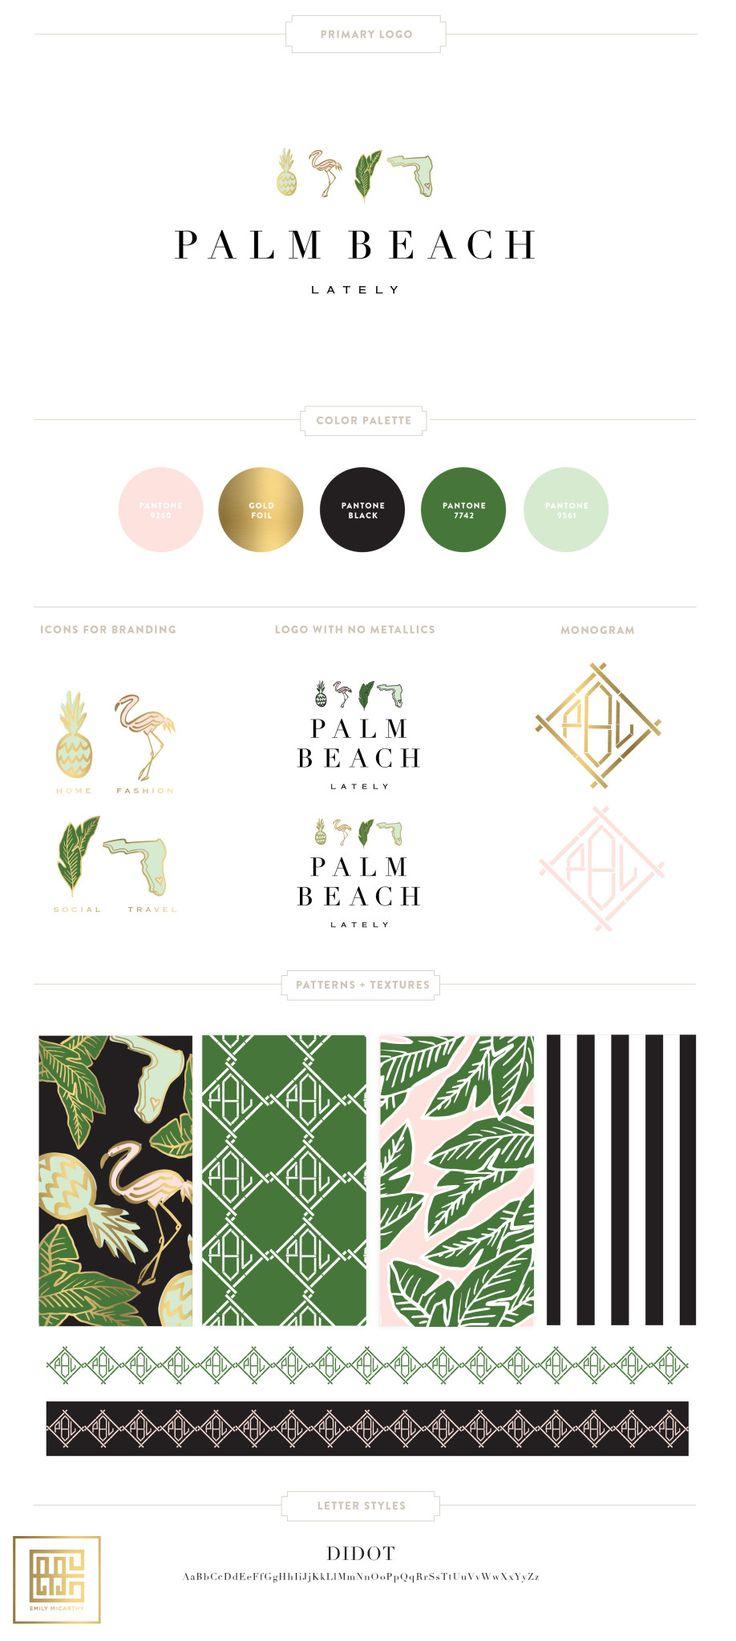 Emily McCarthy Brand | Palm Beach Lately Branding Board | www.emilymccarthy.com #branding